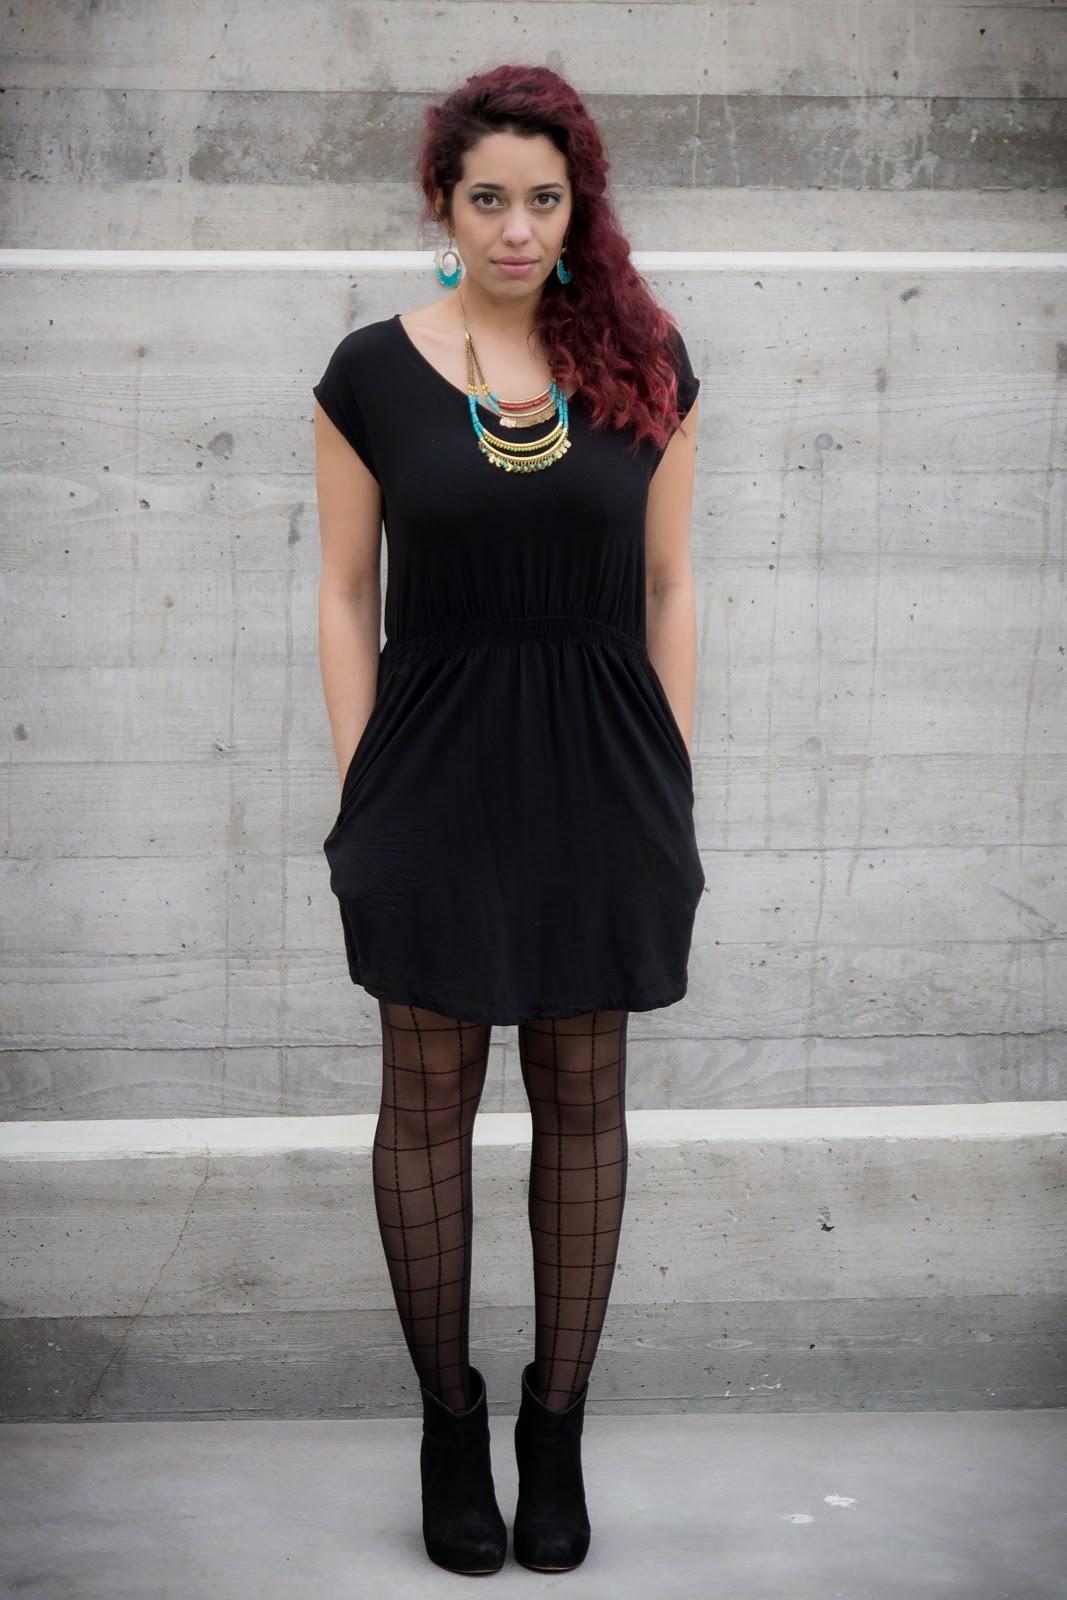 pattern black tights with black dress - HD1067×1600